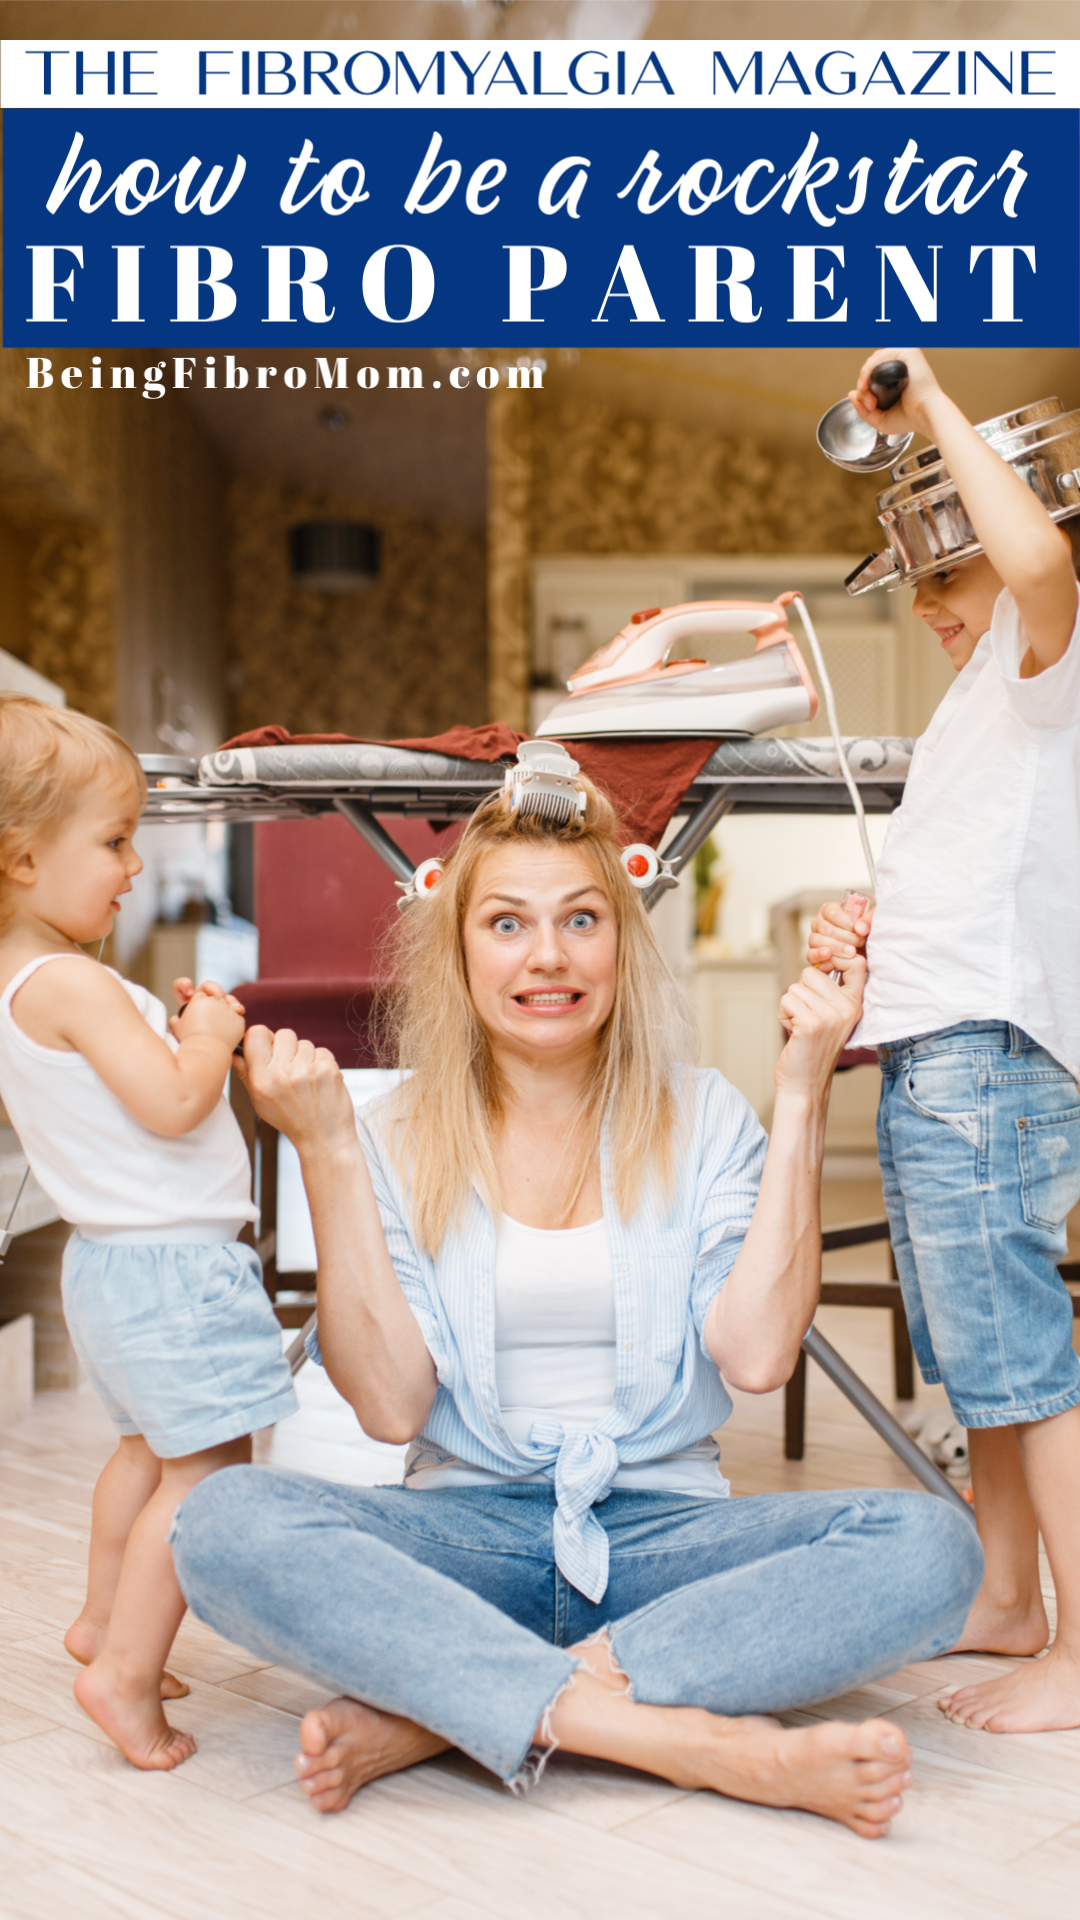 #TheFibromyalgiamagazine How to be a rockstar fibro parent #beingfibromom #fibromyalgia #fibroparent